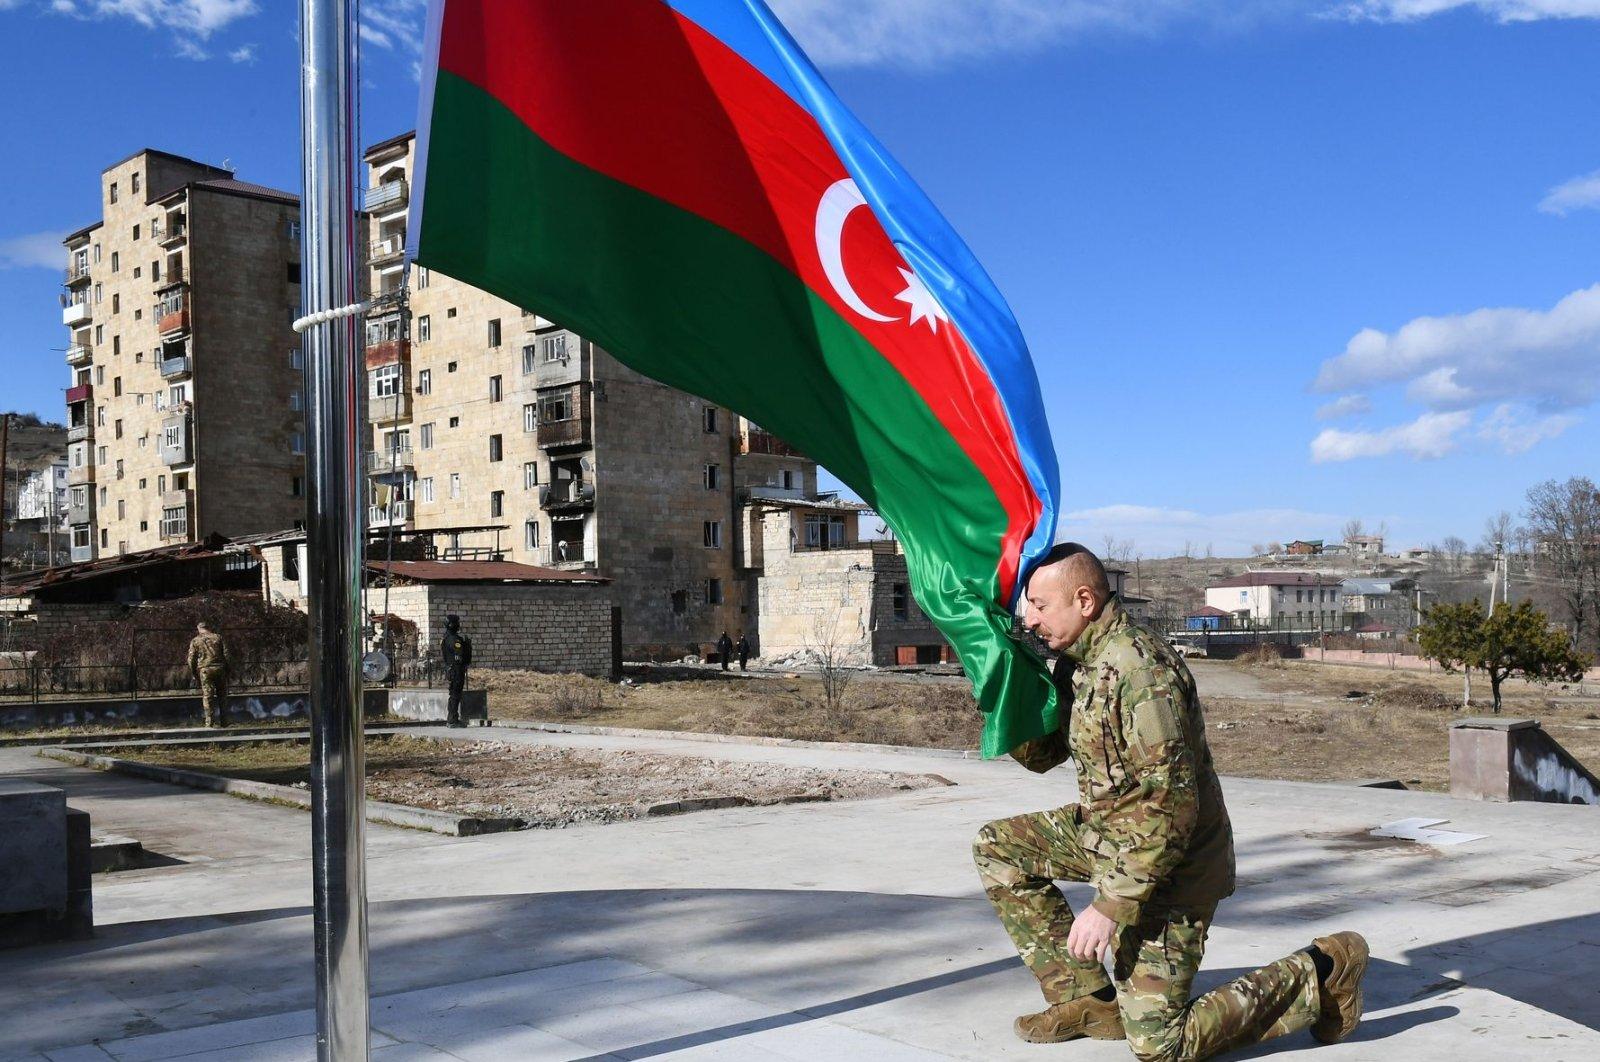 Azerbaijani President Ilham Aliyev kneels in front of the national flag during his visit to the historic town of Shusha in Nagorno-Karabakh, Azerbaijan, Jan. 15, 2021.